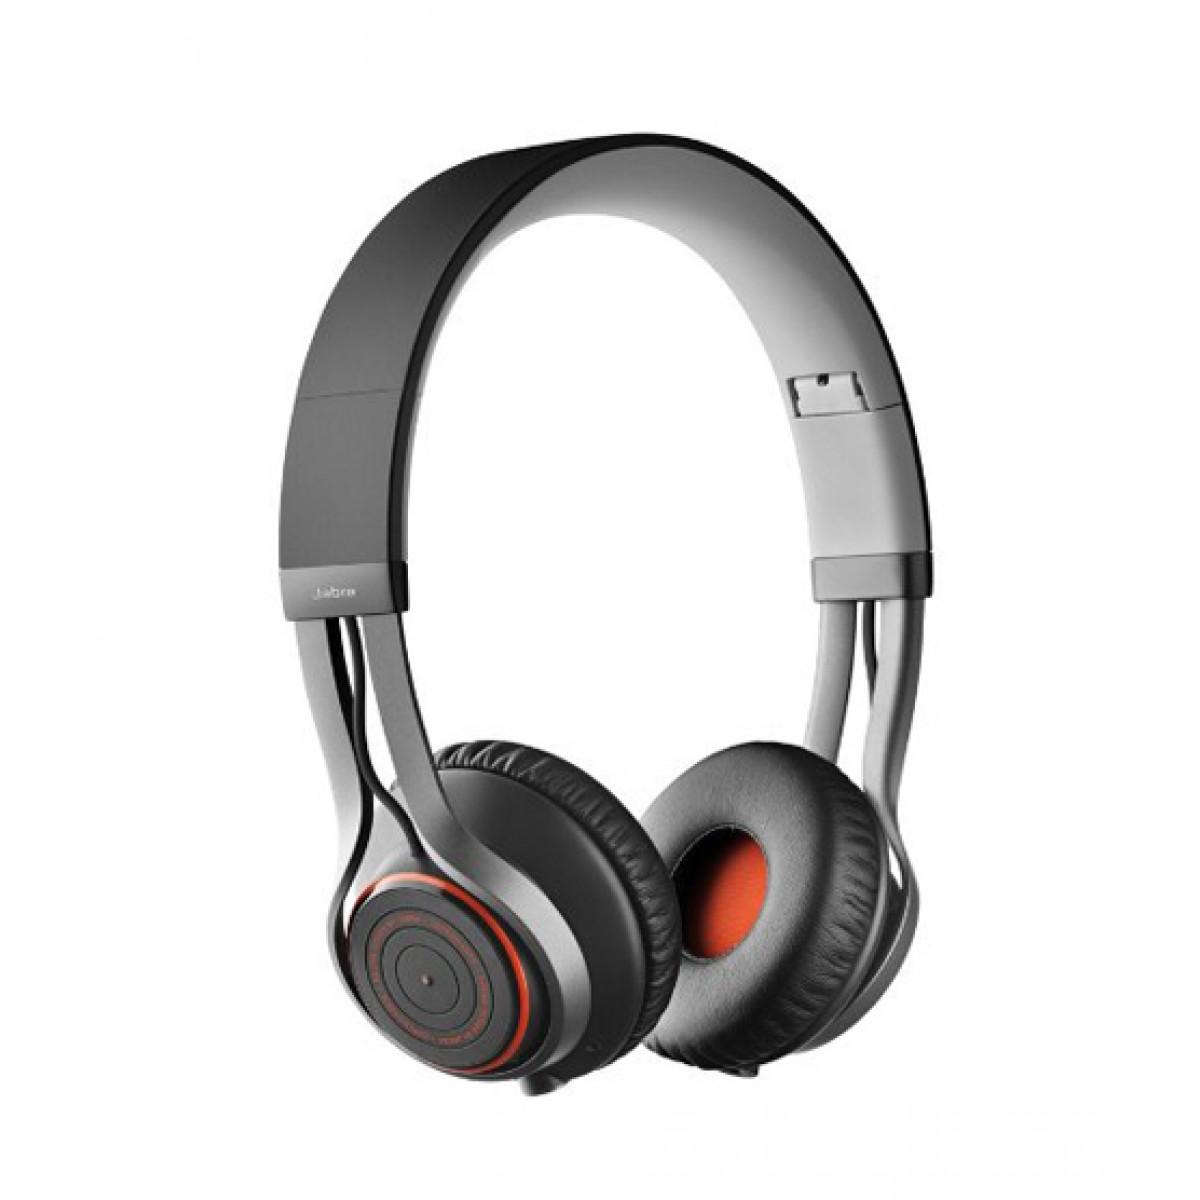 Jabra Revo Bluetooth Headset Price In Pakistan Buy Jabra Revo Bluetooth Stereo Headset Ishopping Pk